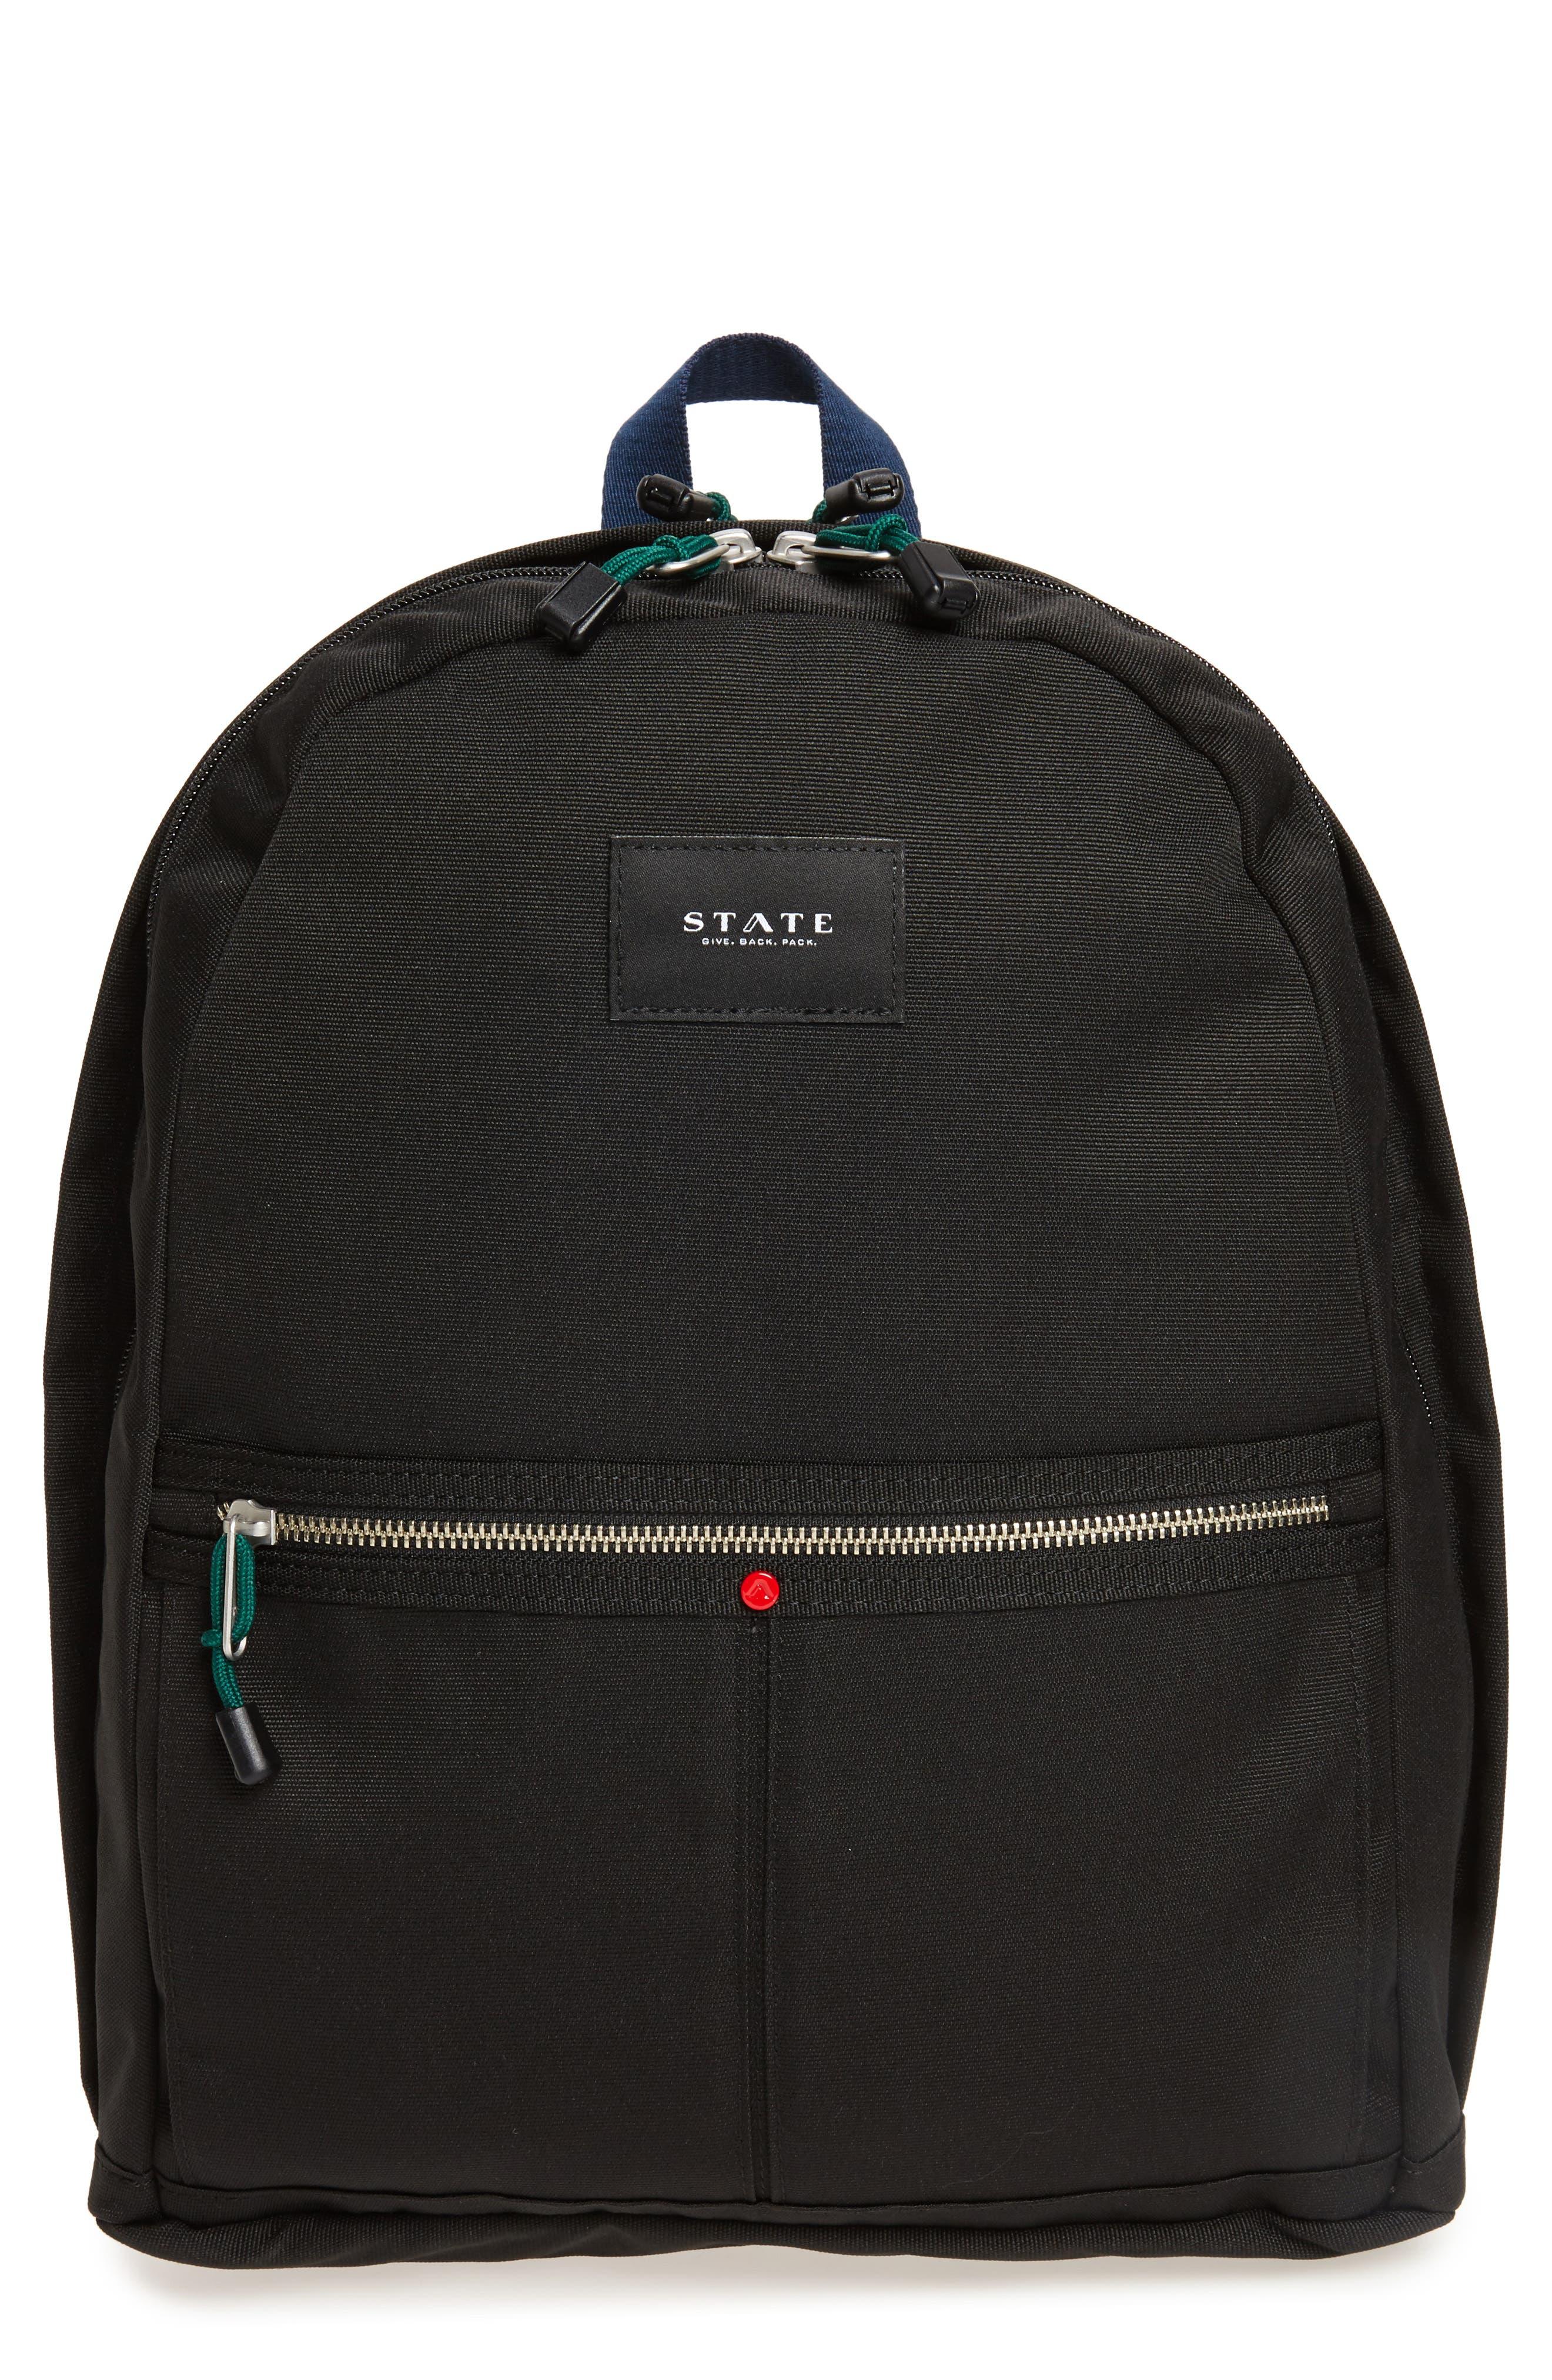 STATE BAGS,                             Kent Backpack,                             Main thumbnail 1, color,                             BLACK